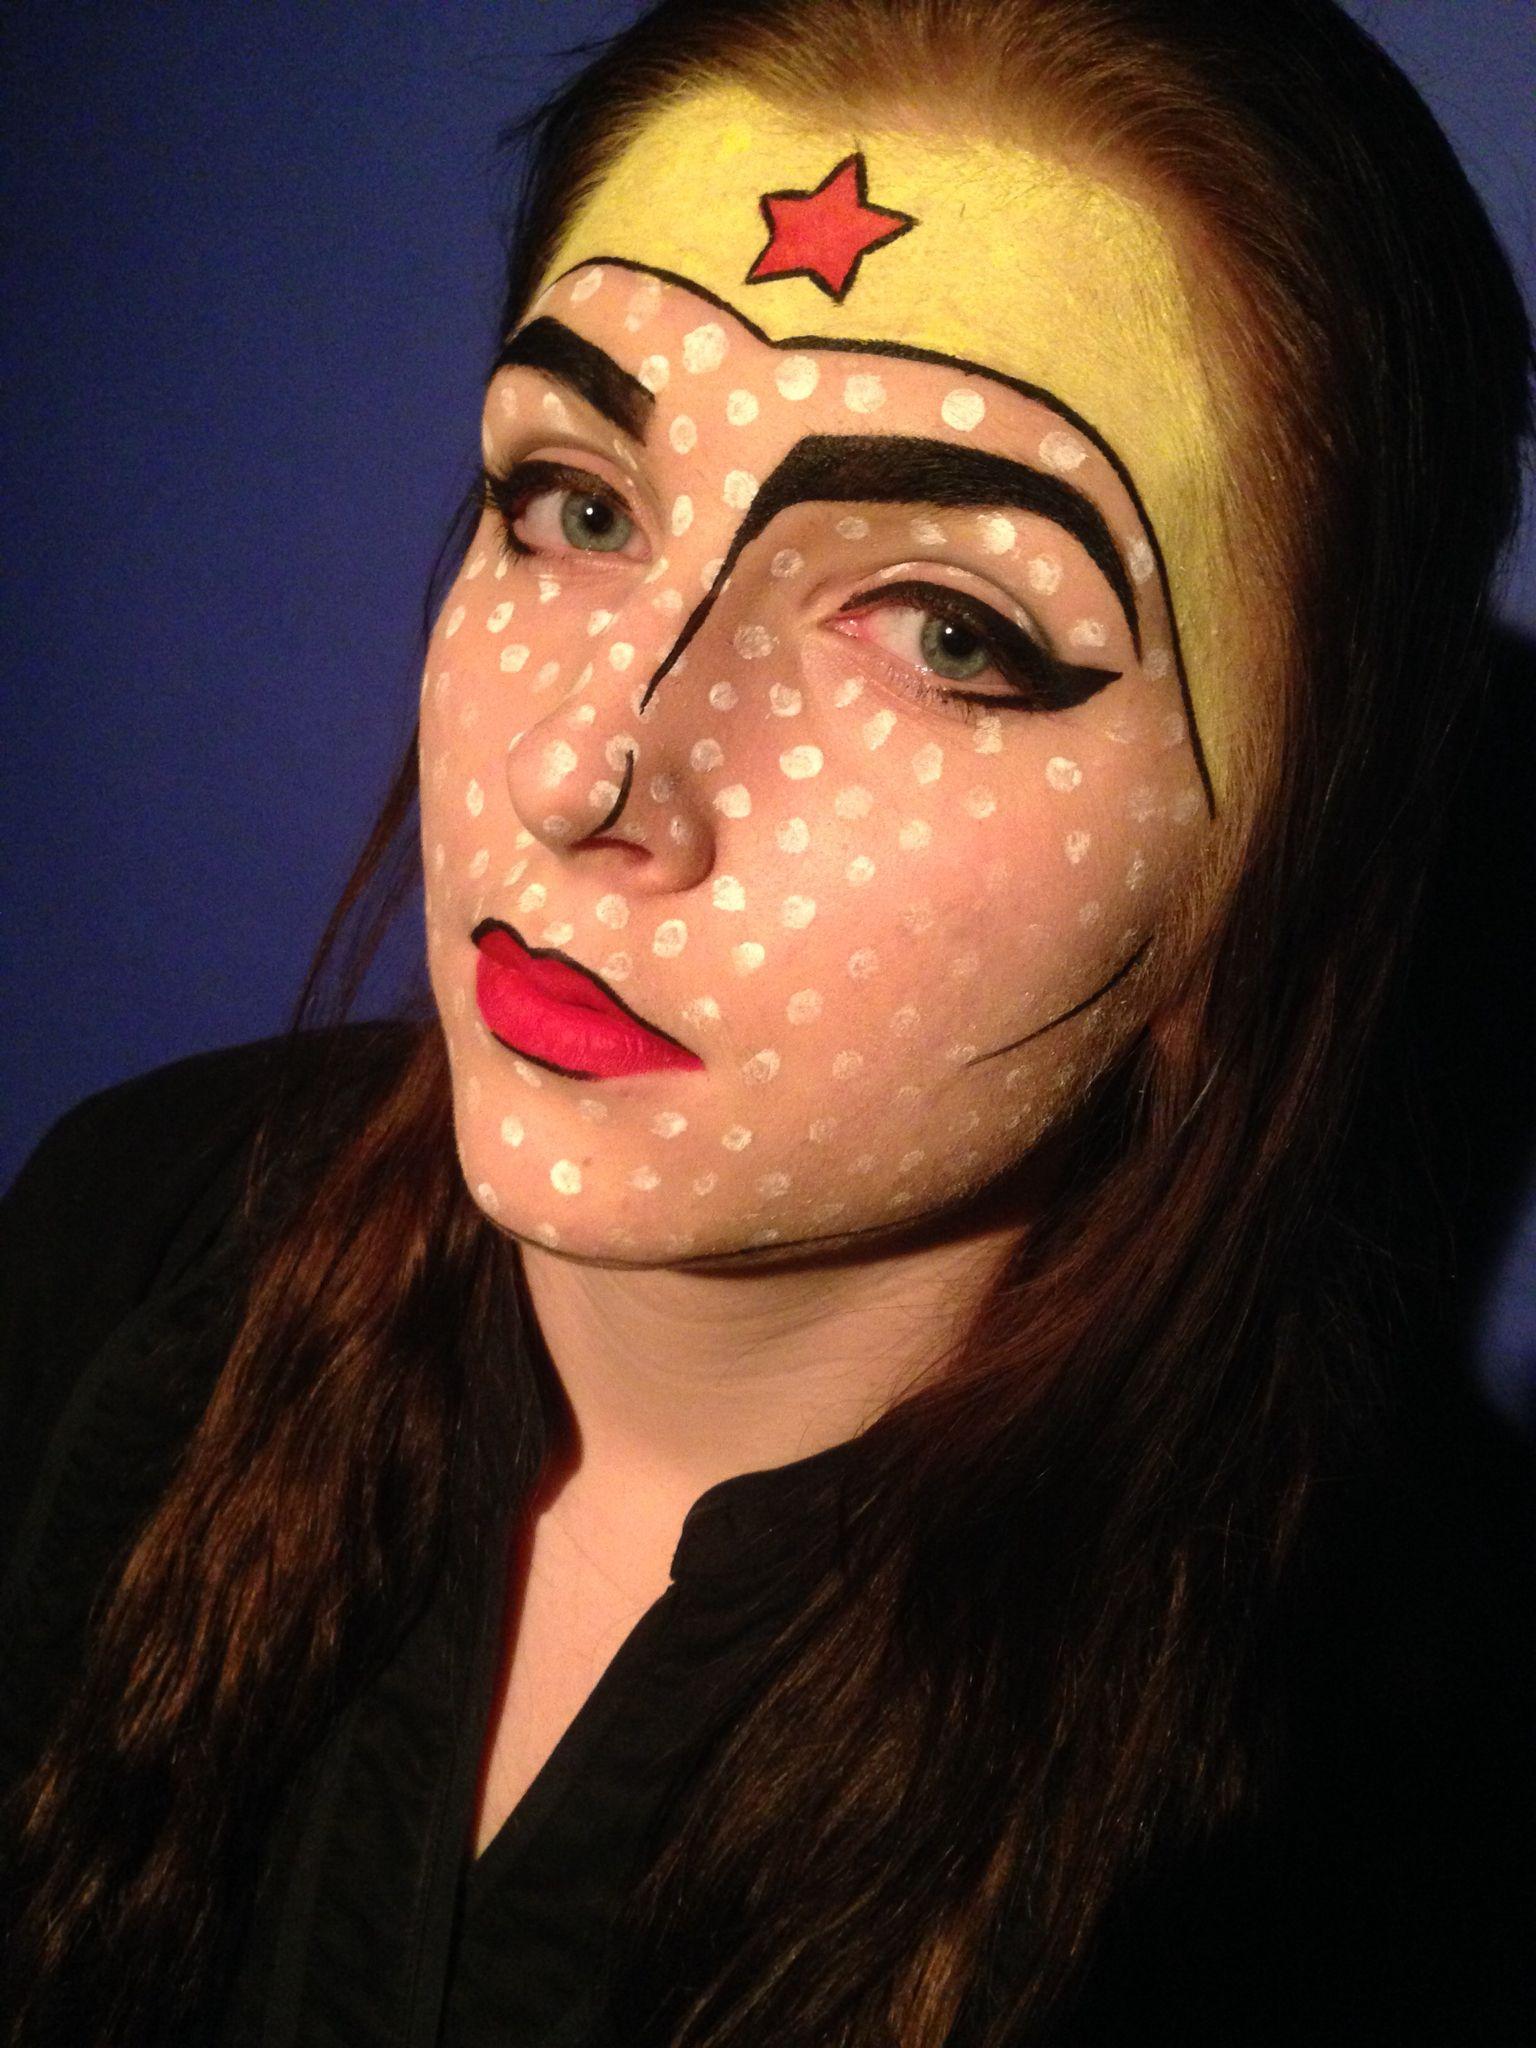 Made Lucy in to Wonder Woman! #wonderwoman #super #hero @charlottegoodayle